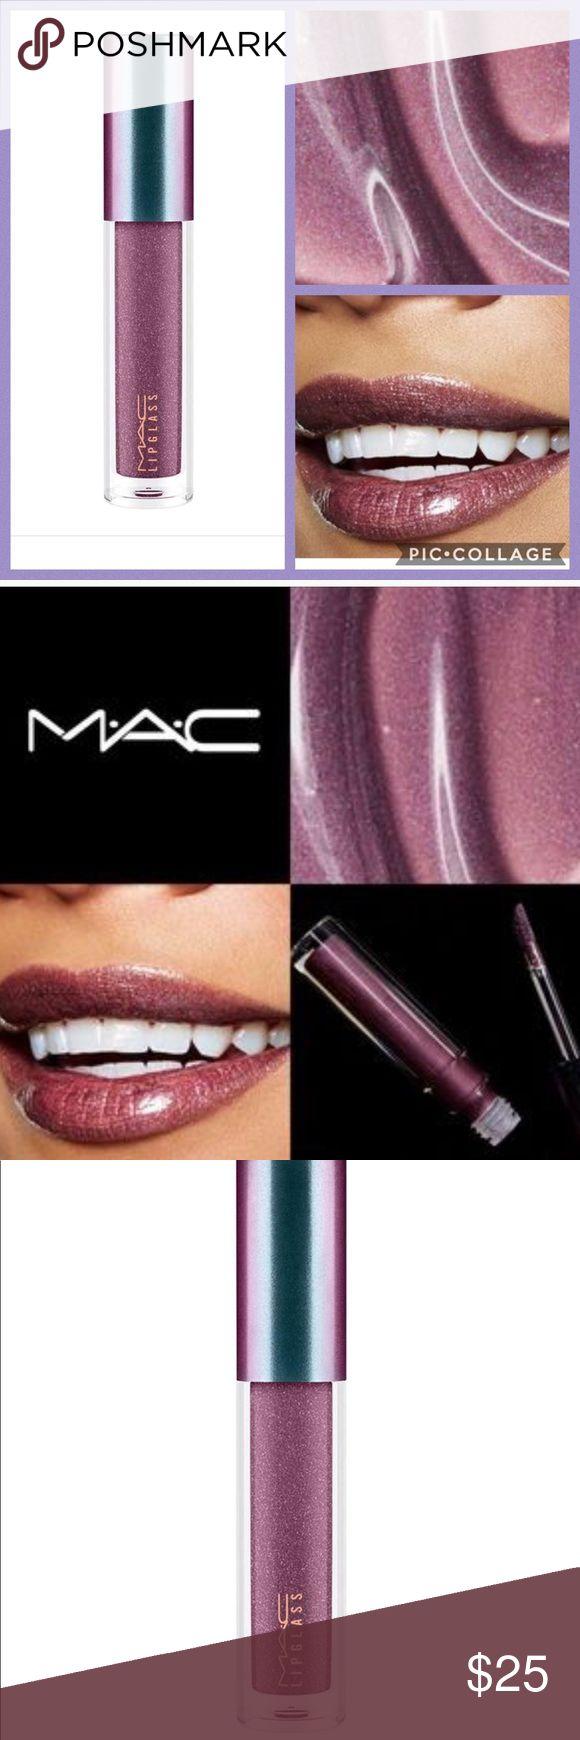 Mac Midnight Dip Lipglass New in box. Very rare and